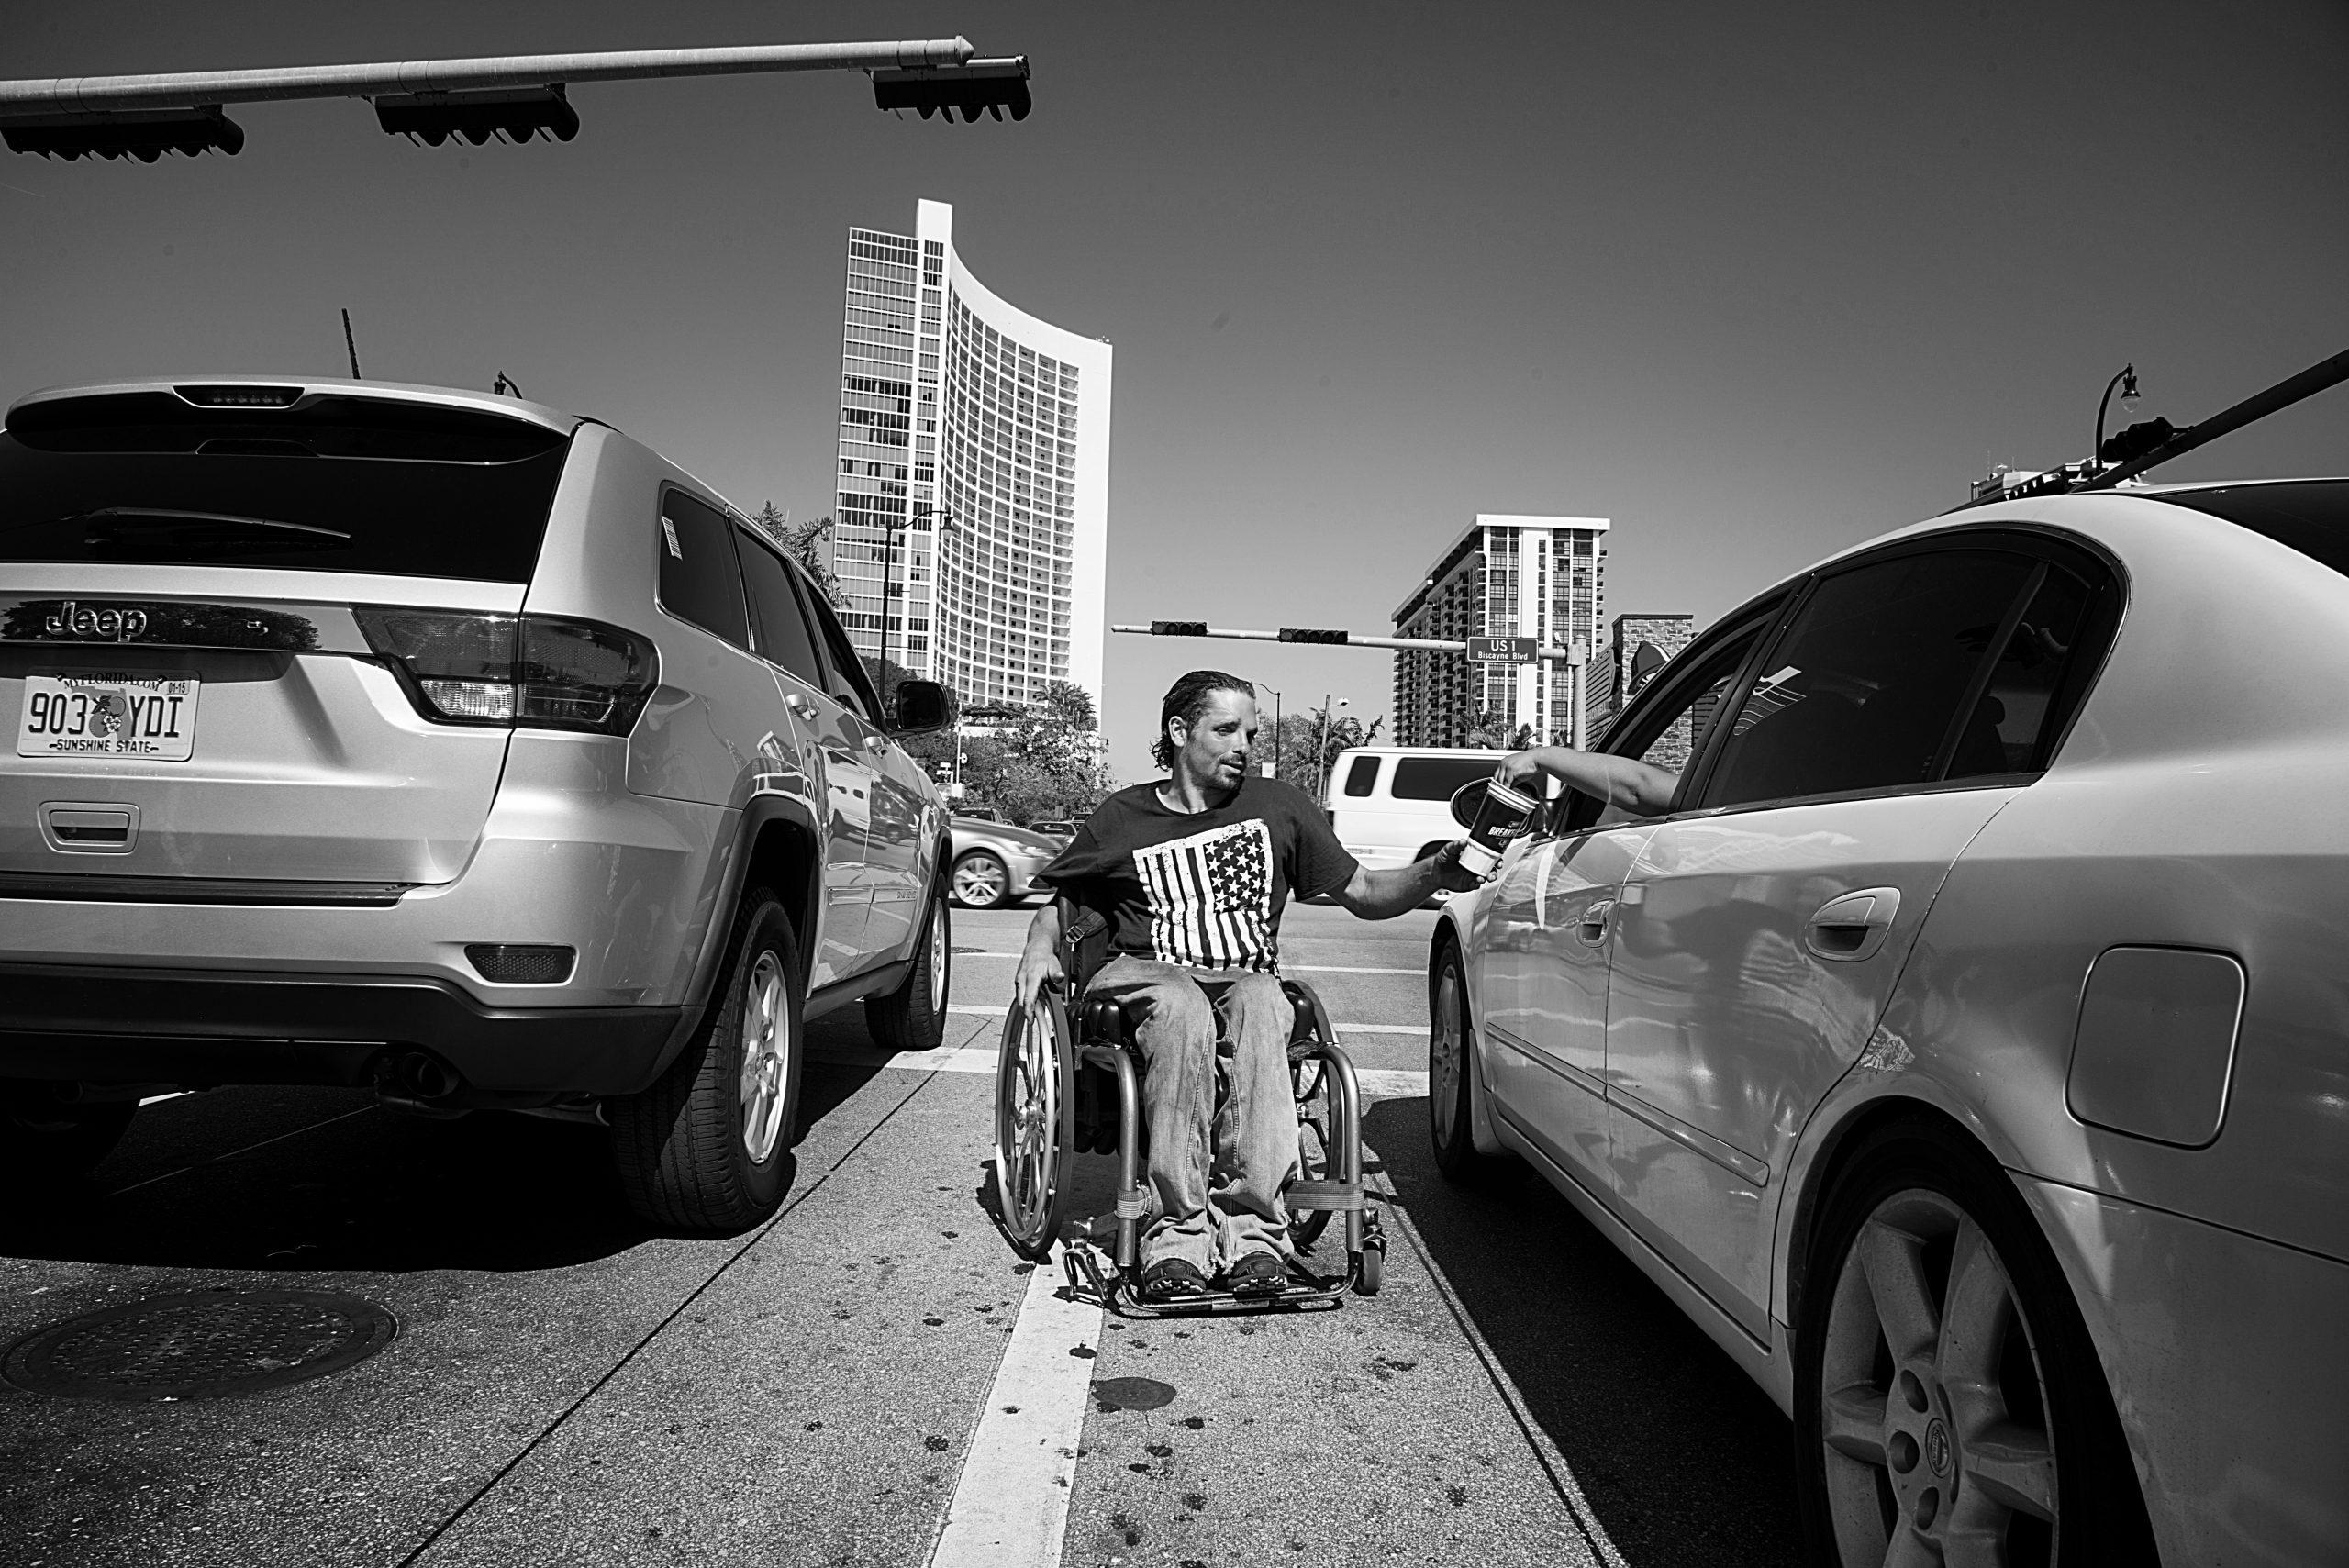 Homeless between cars